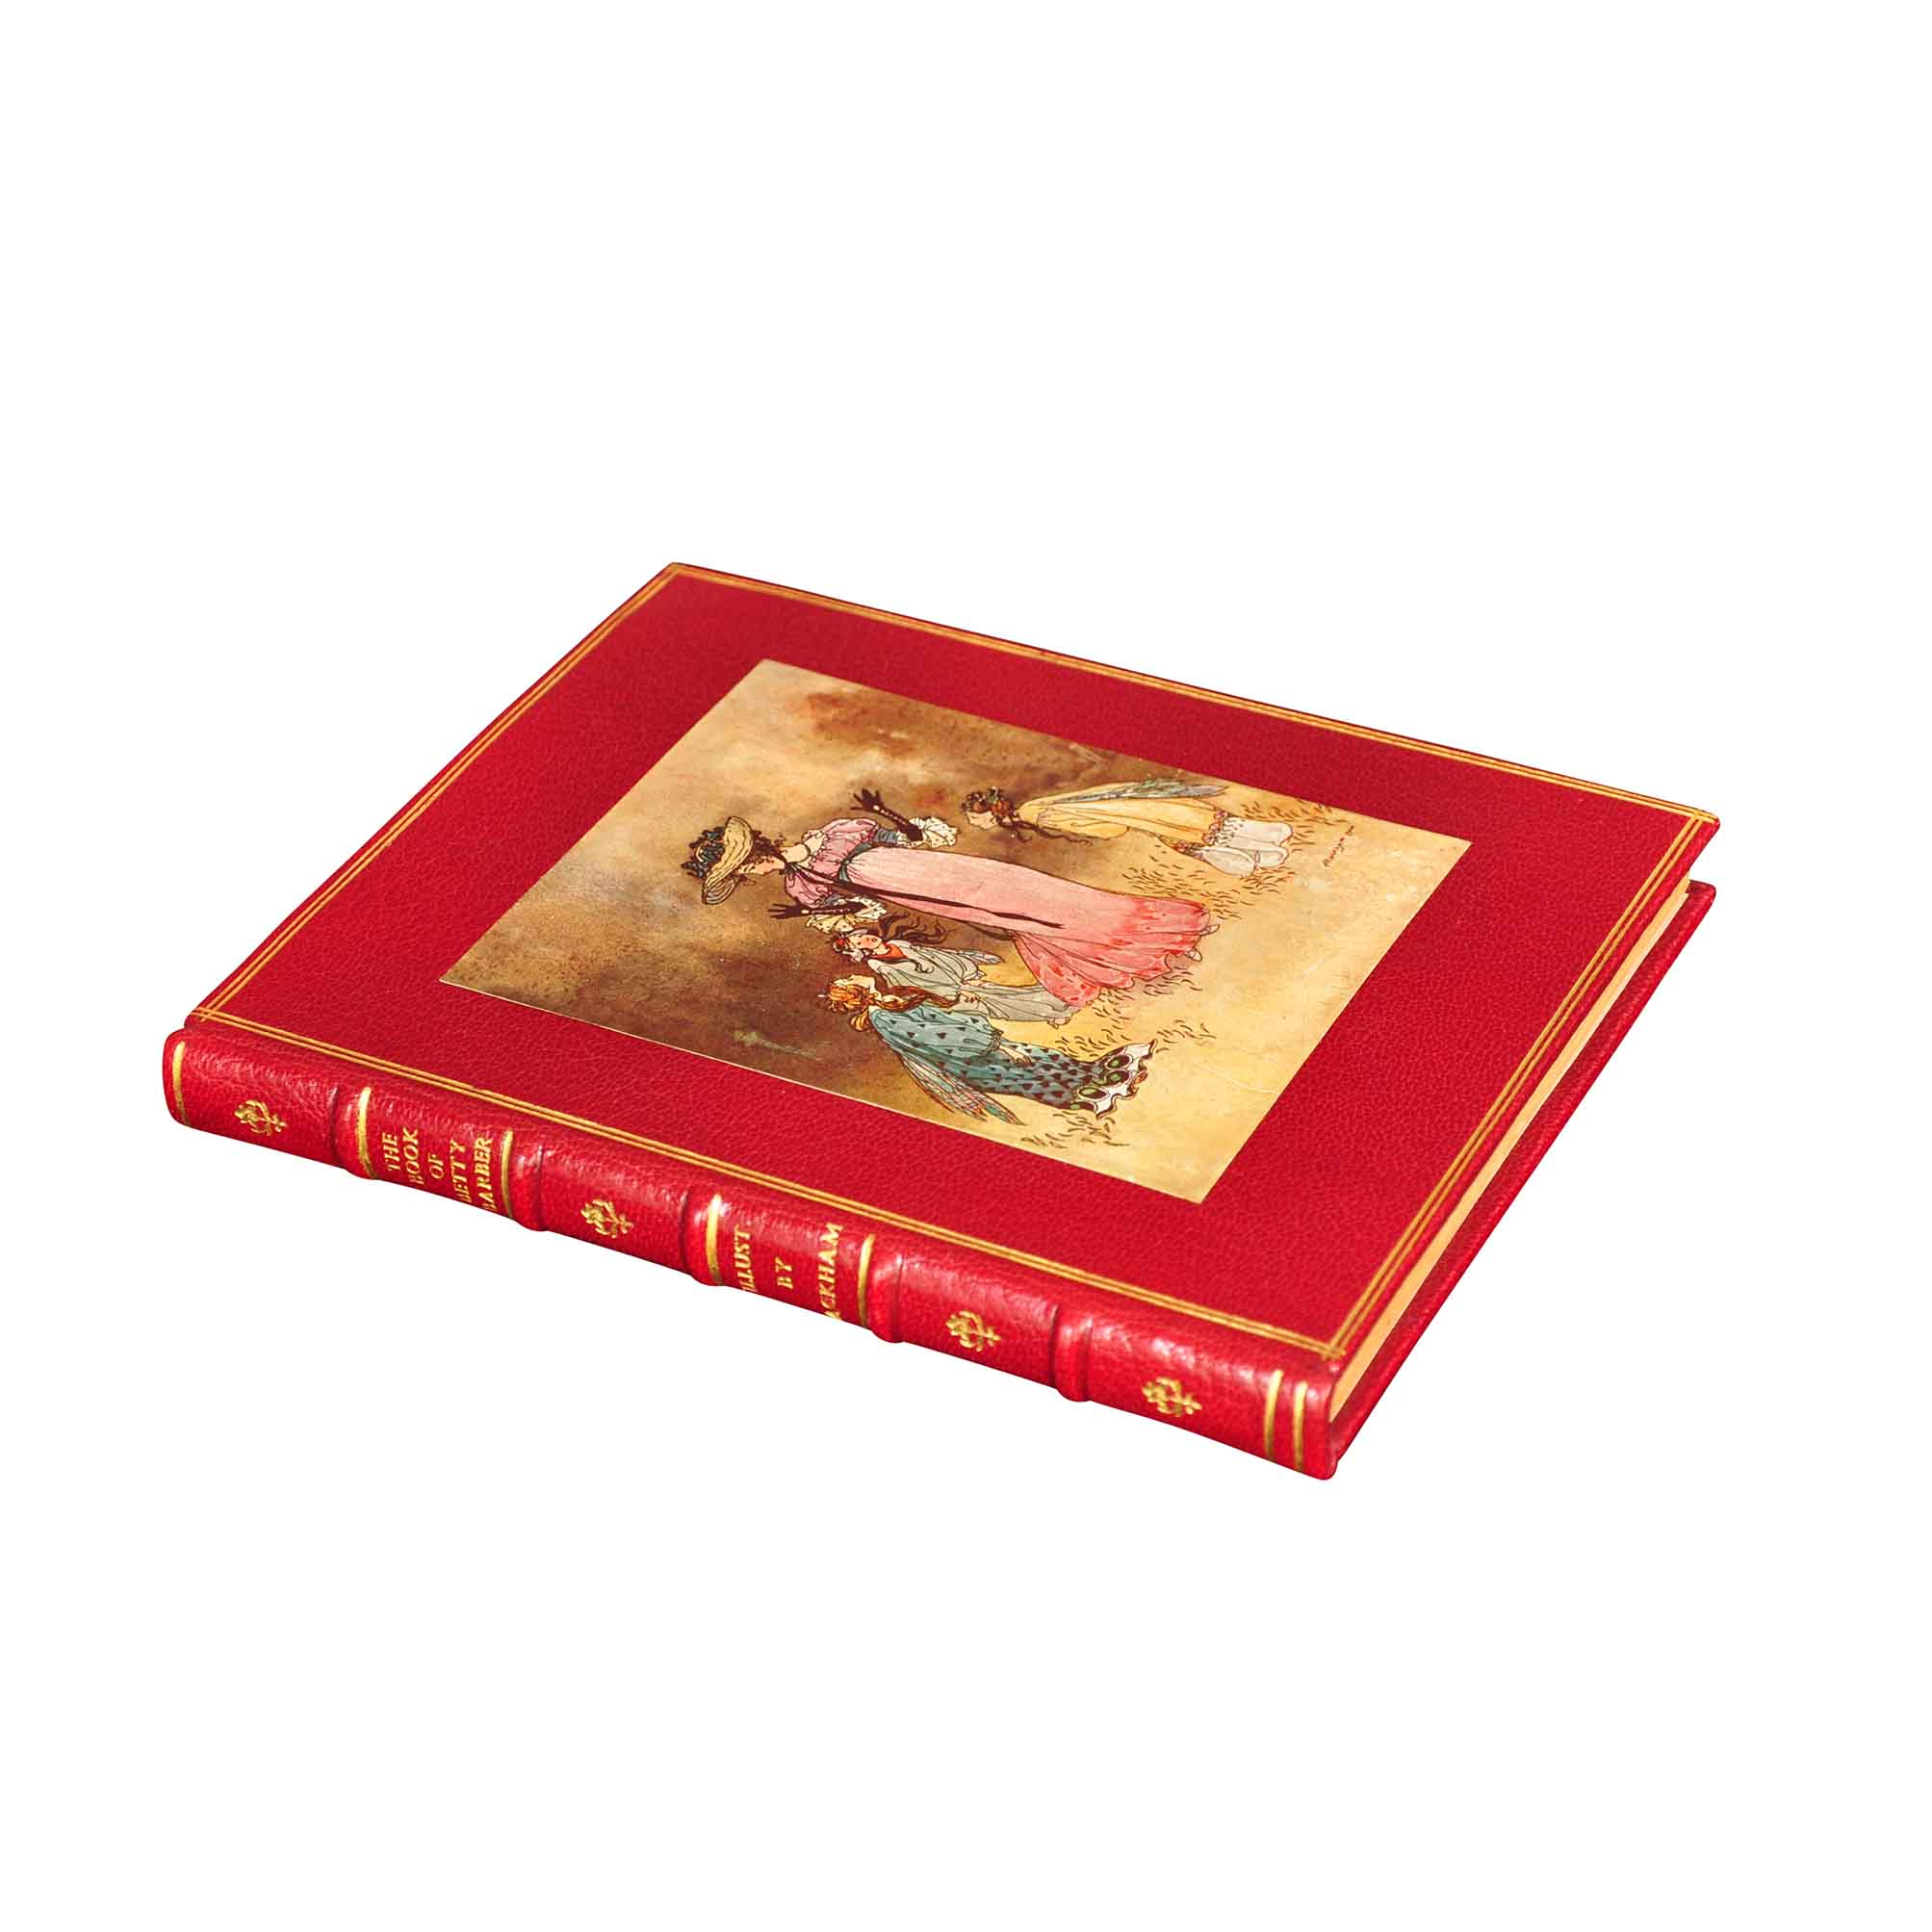 5683-Browne-Rackham-Betty-Barber-1910-binding-recto-N.jpg